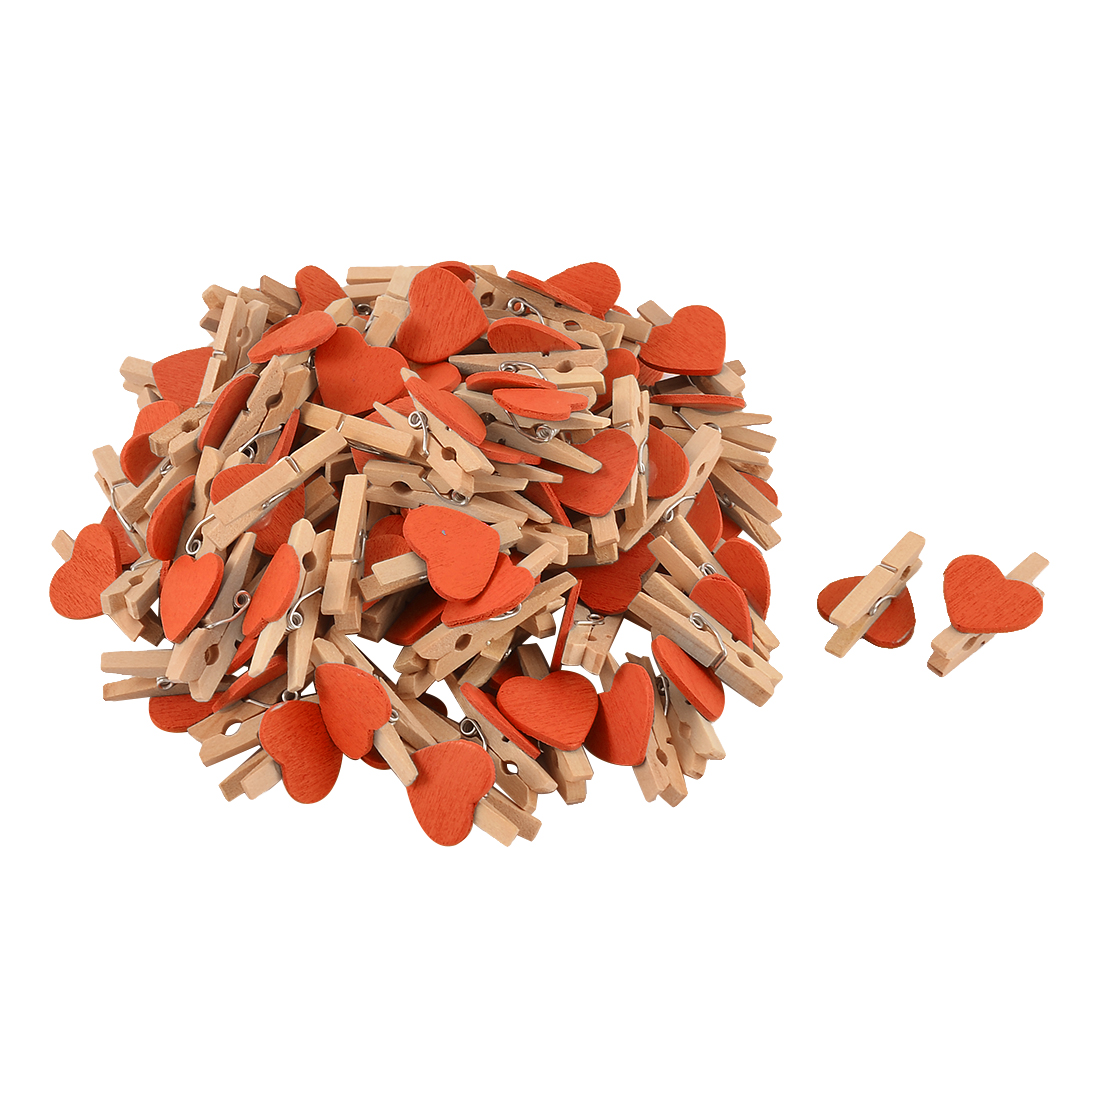 Card Photo Clothes DIY Crafts Spring Pegs Mini Wooden Clip Orange 100pcs